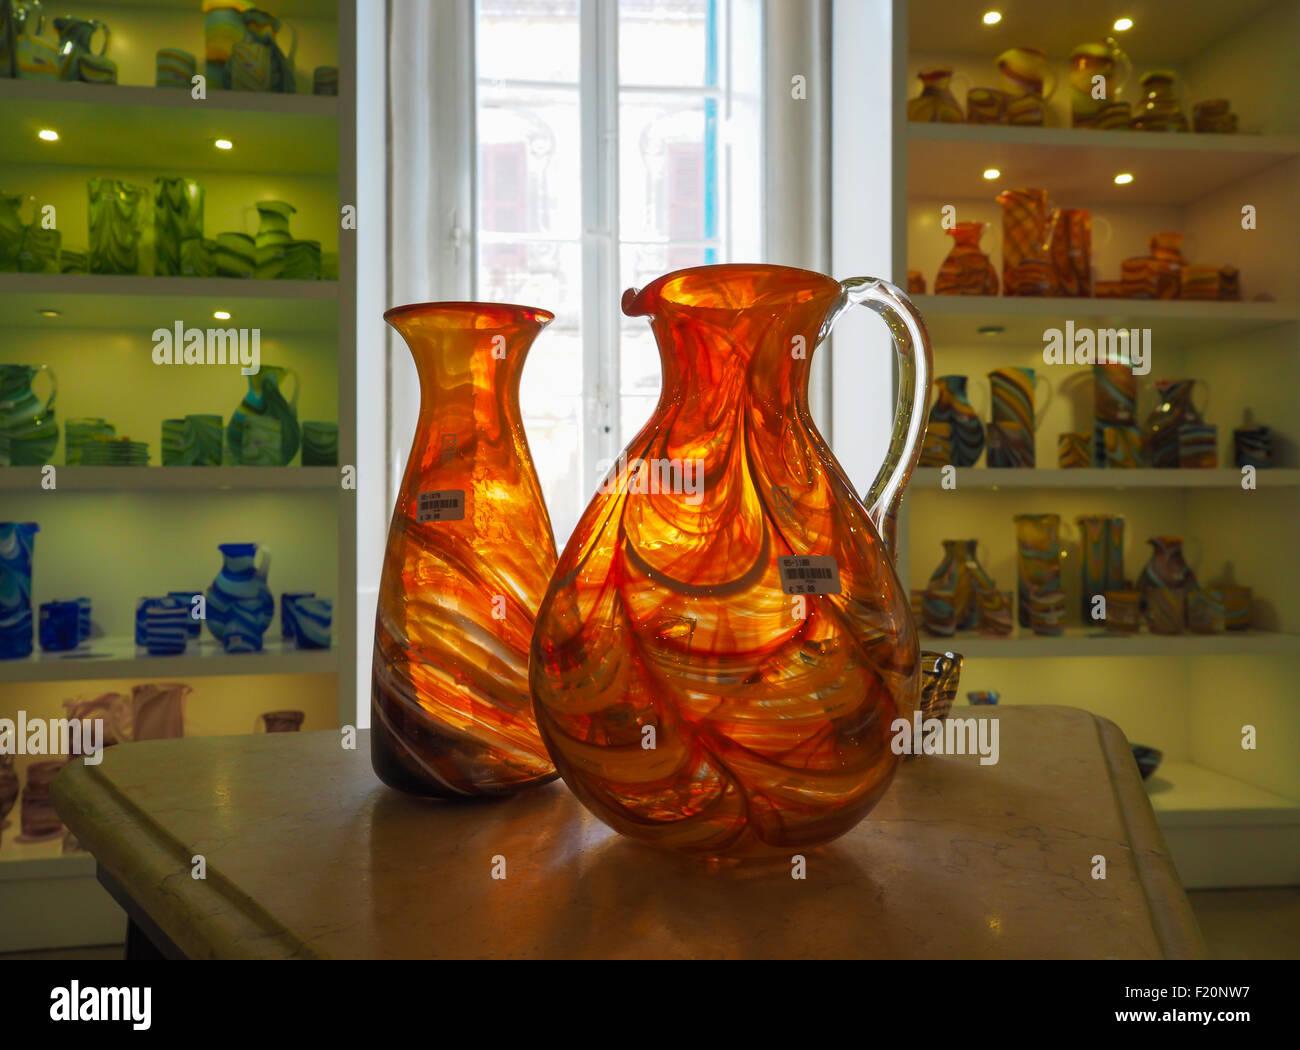 Cristalería tradicional de Mdina, Malta Imagen De Stock